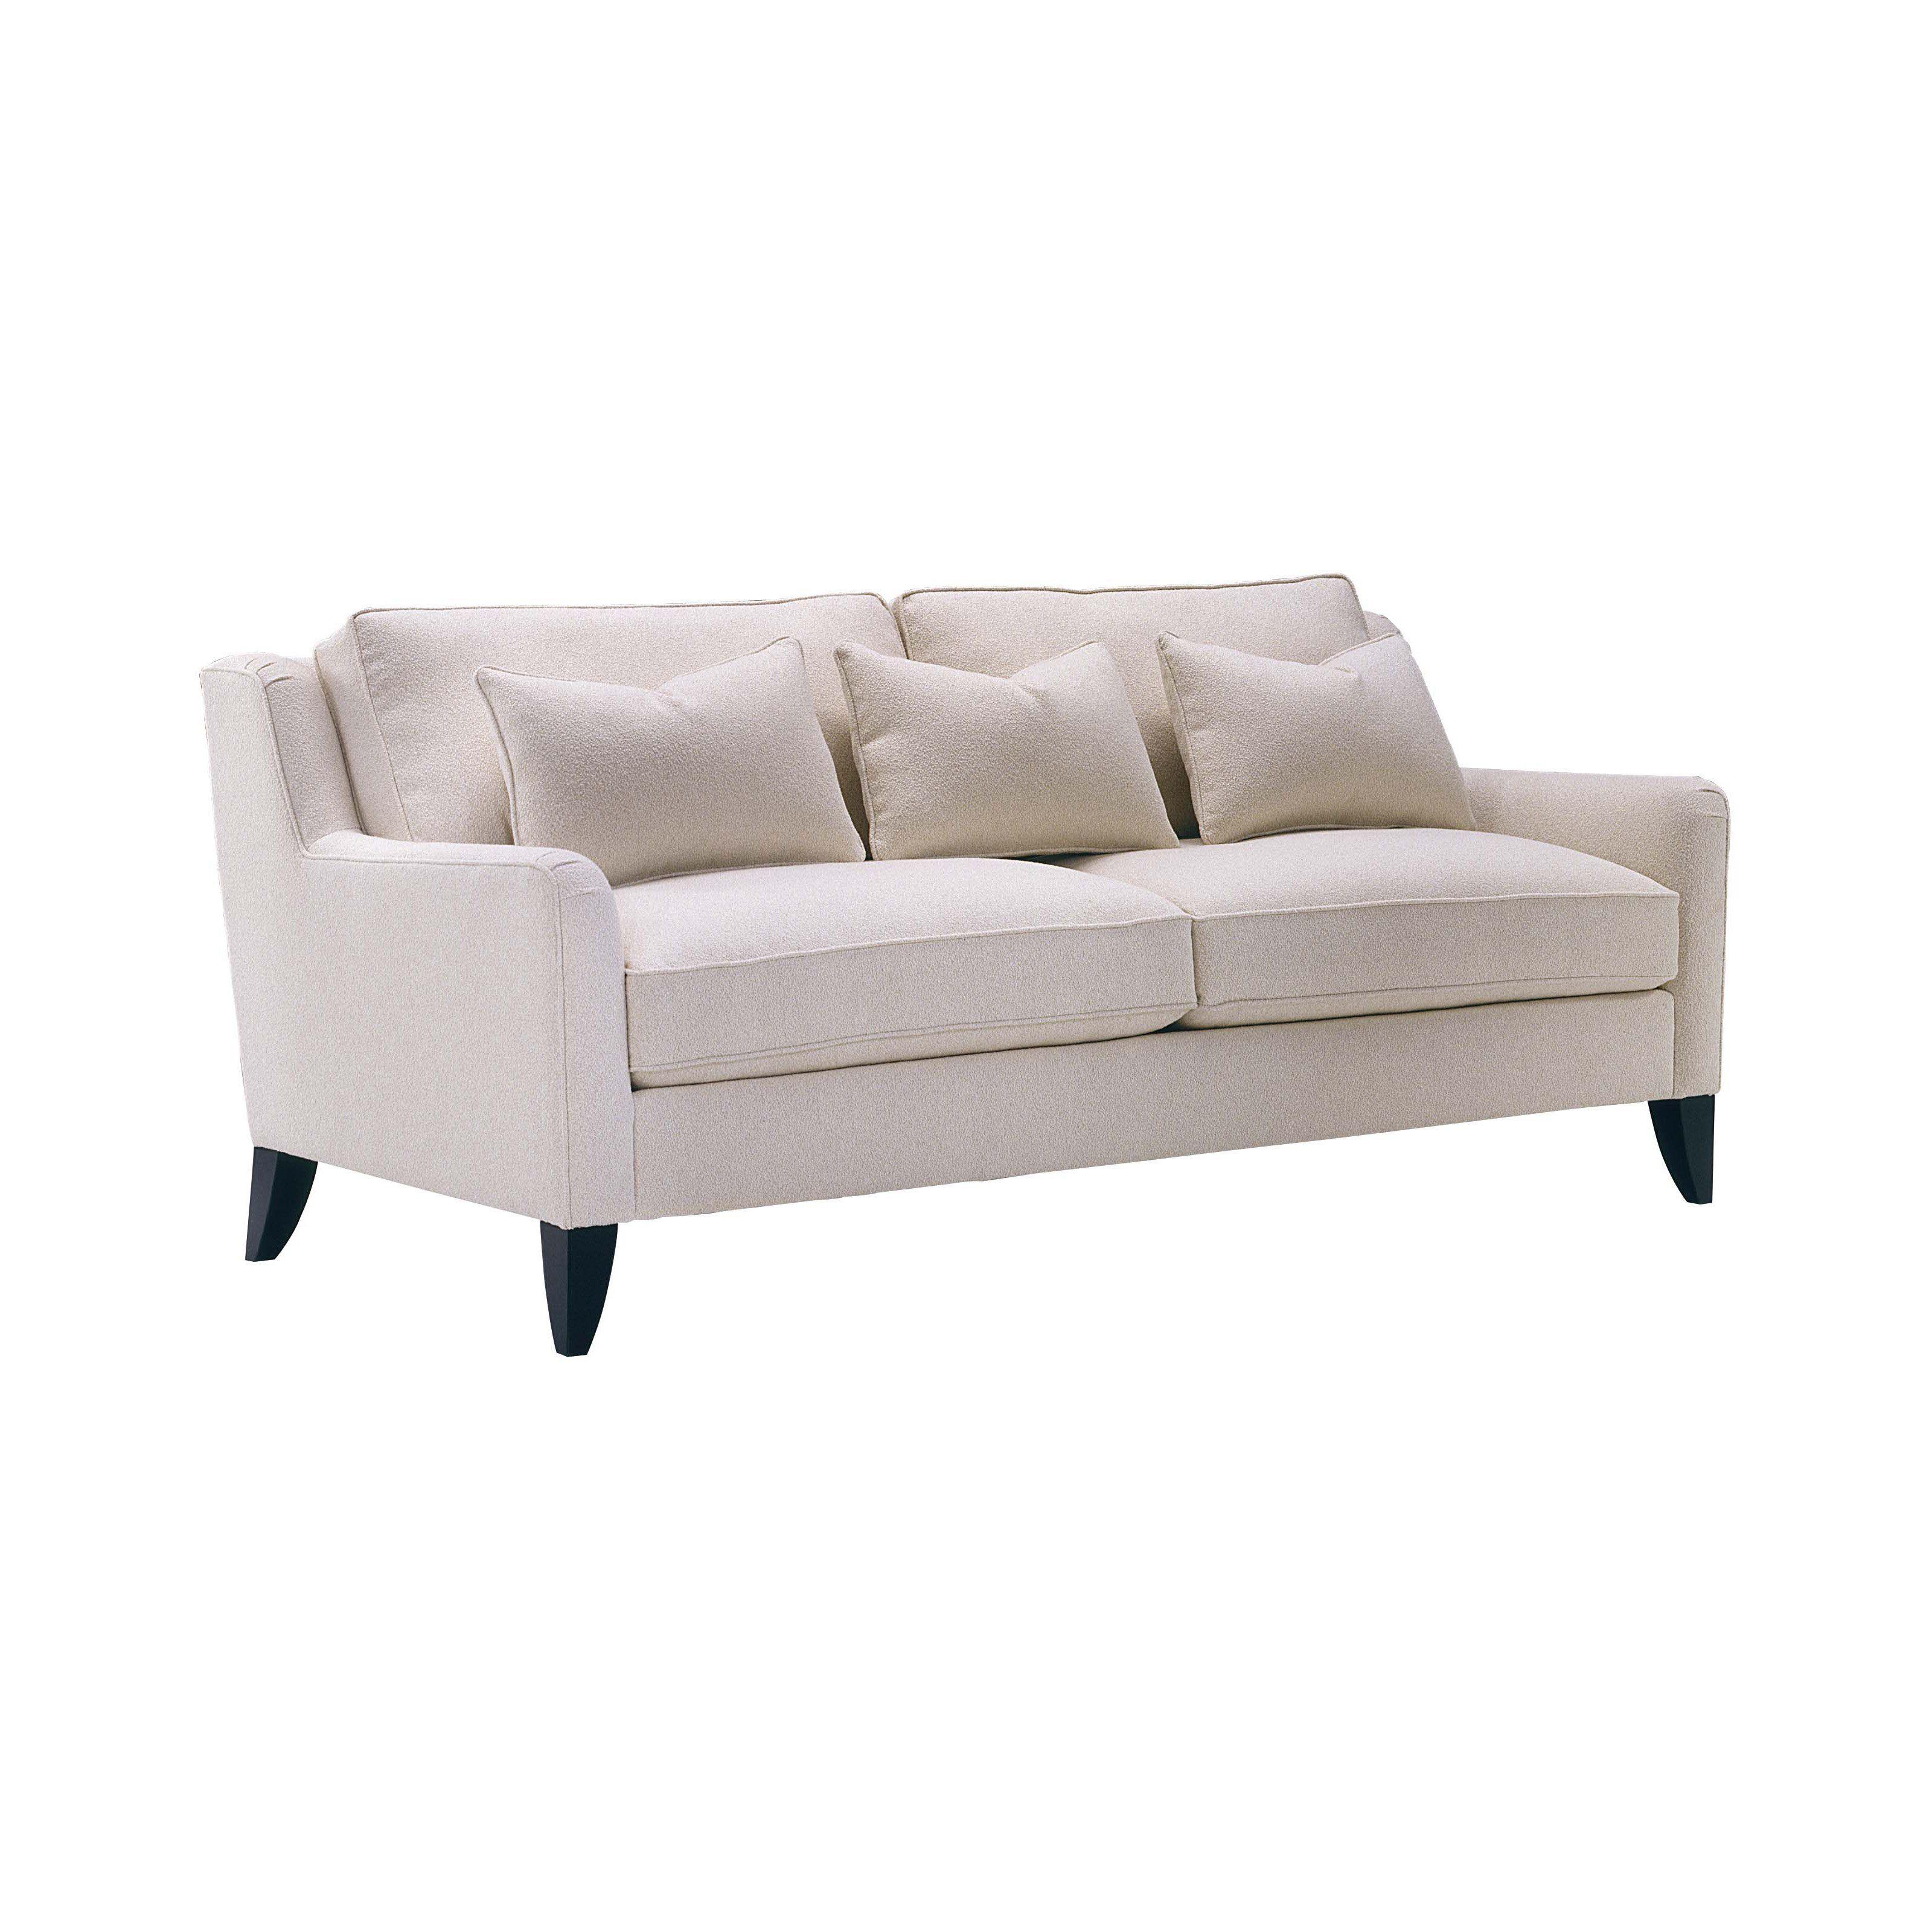 Charmant Lazar Retro Bellisimo White Fabric Sofa | From Hayneedle.com